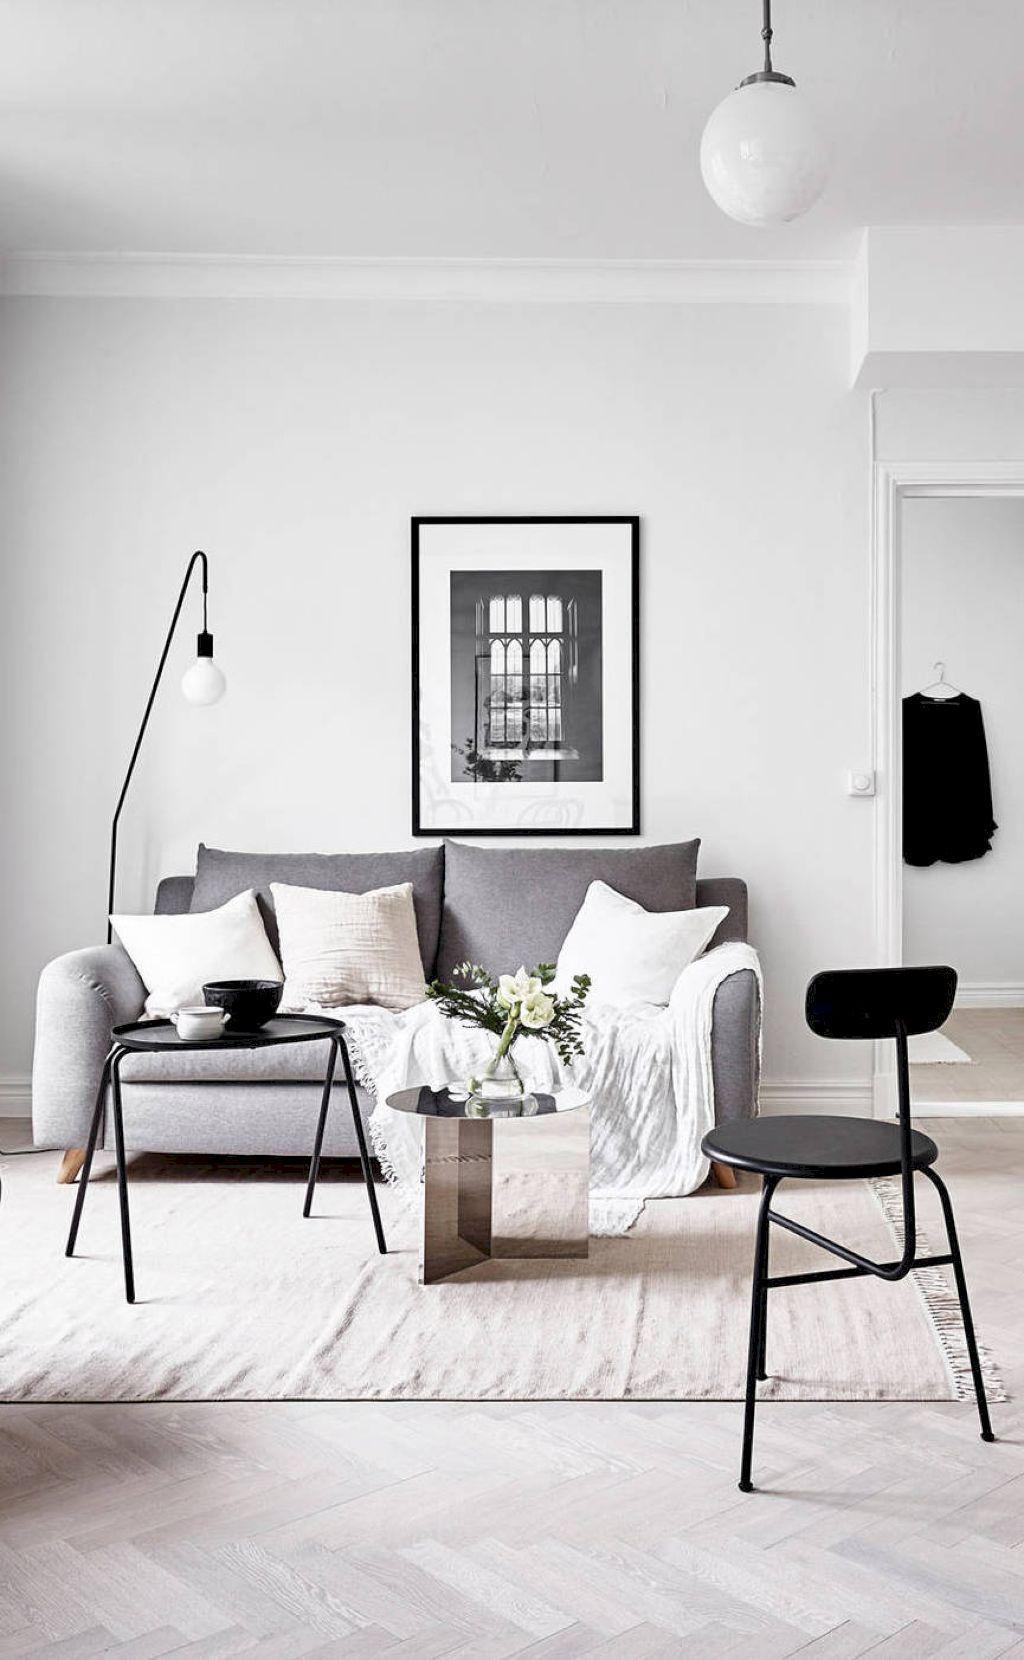 45 Genius Ideas To Design And Create Gorgeous Spaces For Your Classy Design Living Room Minimalist Design Decoration